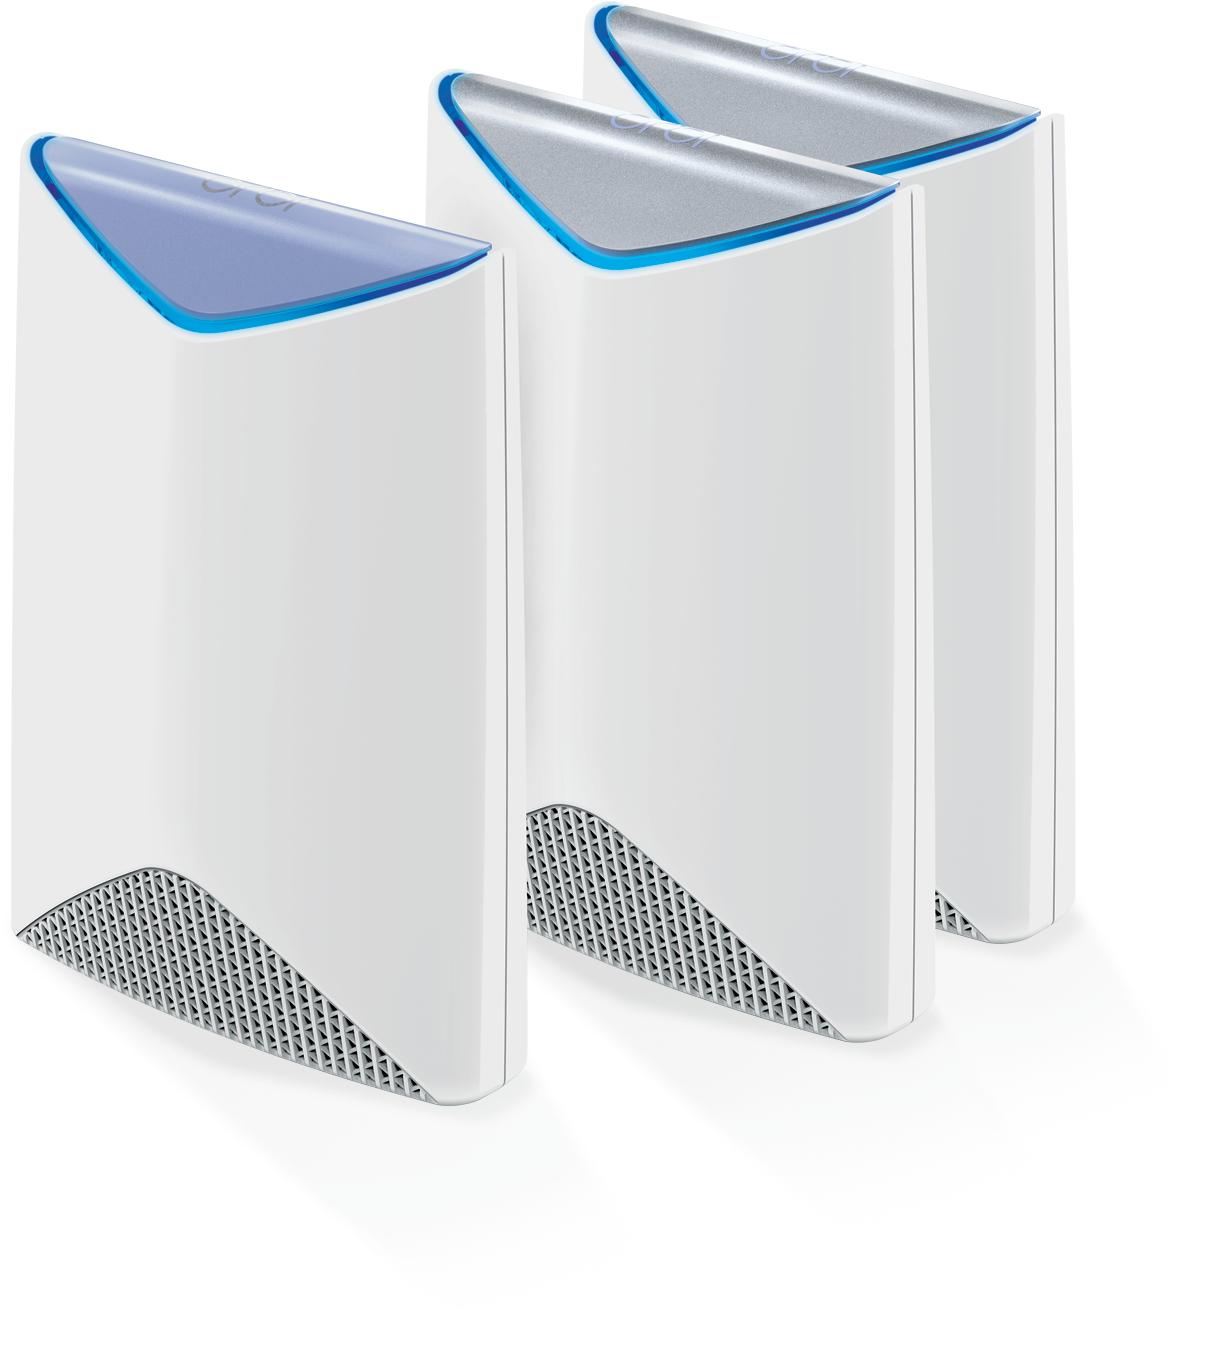 Netgear SRK60B03 draadloze router Tri-band (2.4 GHz / 5 GHz / 5 GHz) Gigabit Ethernet Wit